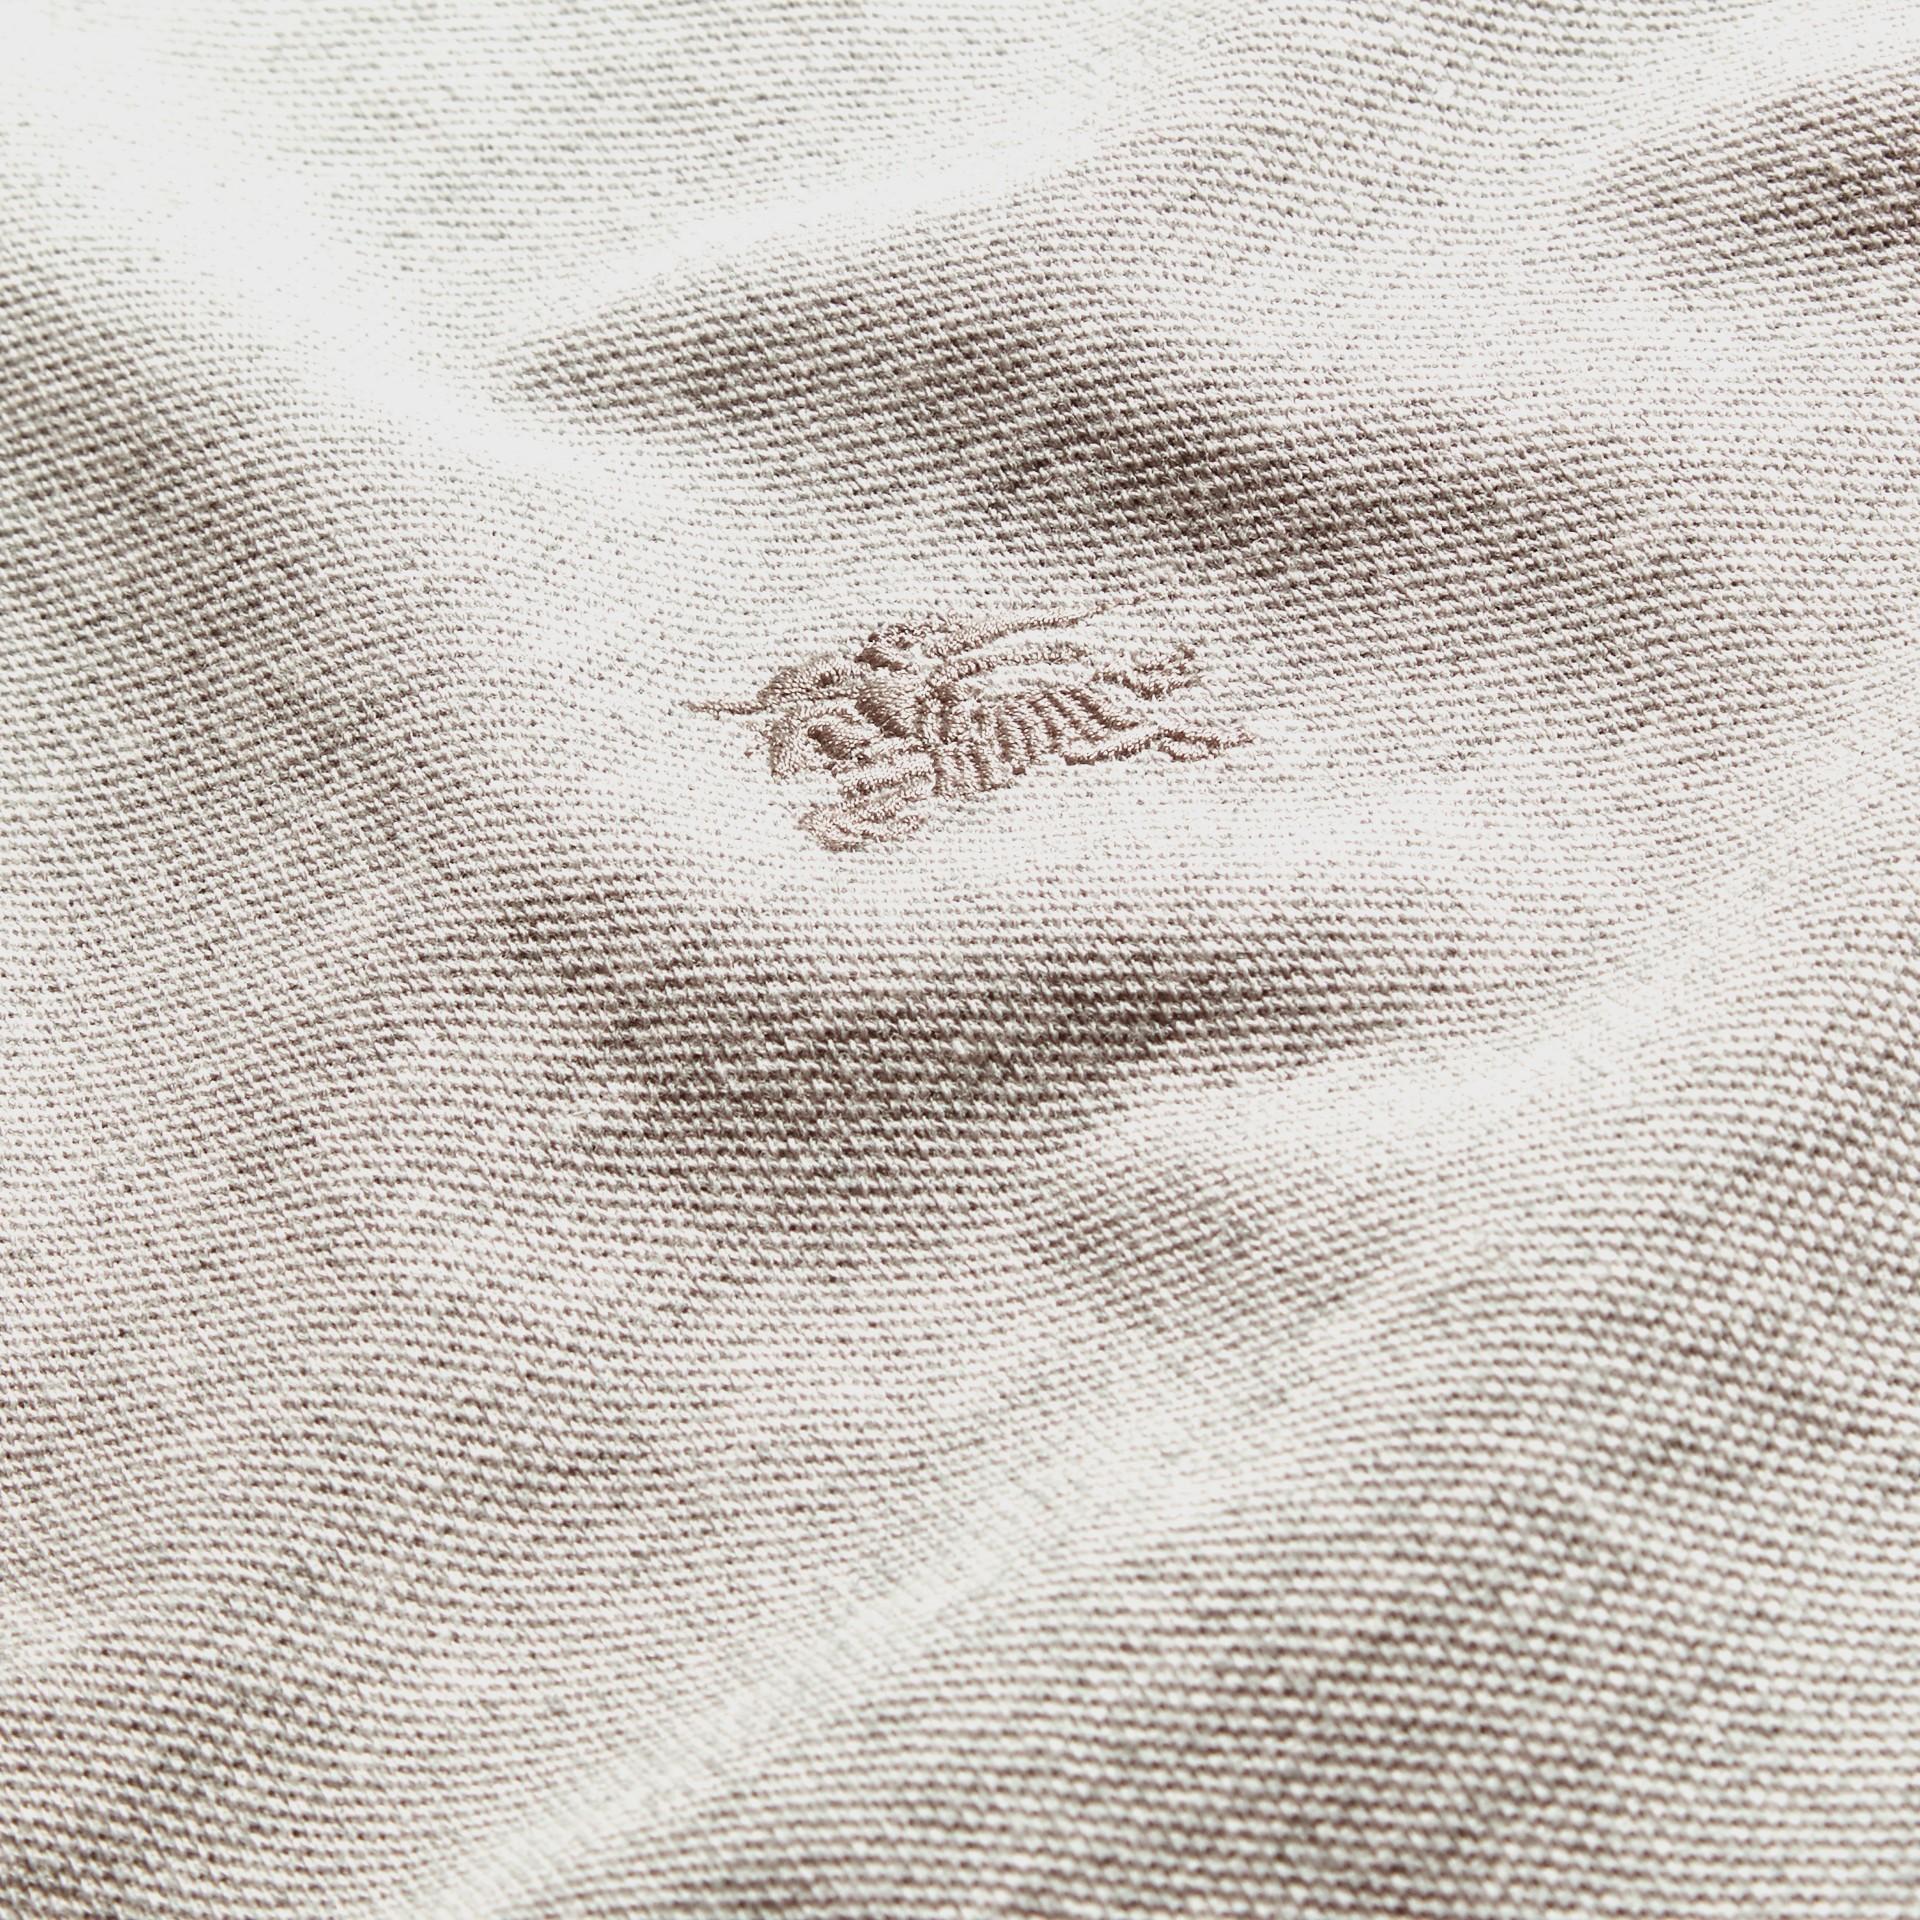 Mezcla de gris pálido Polo de manga larga con tira de botones a checks Mezcla  Gris Pálido - imagen de la galería 2